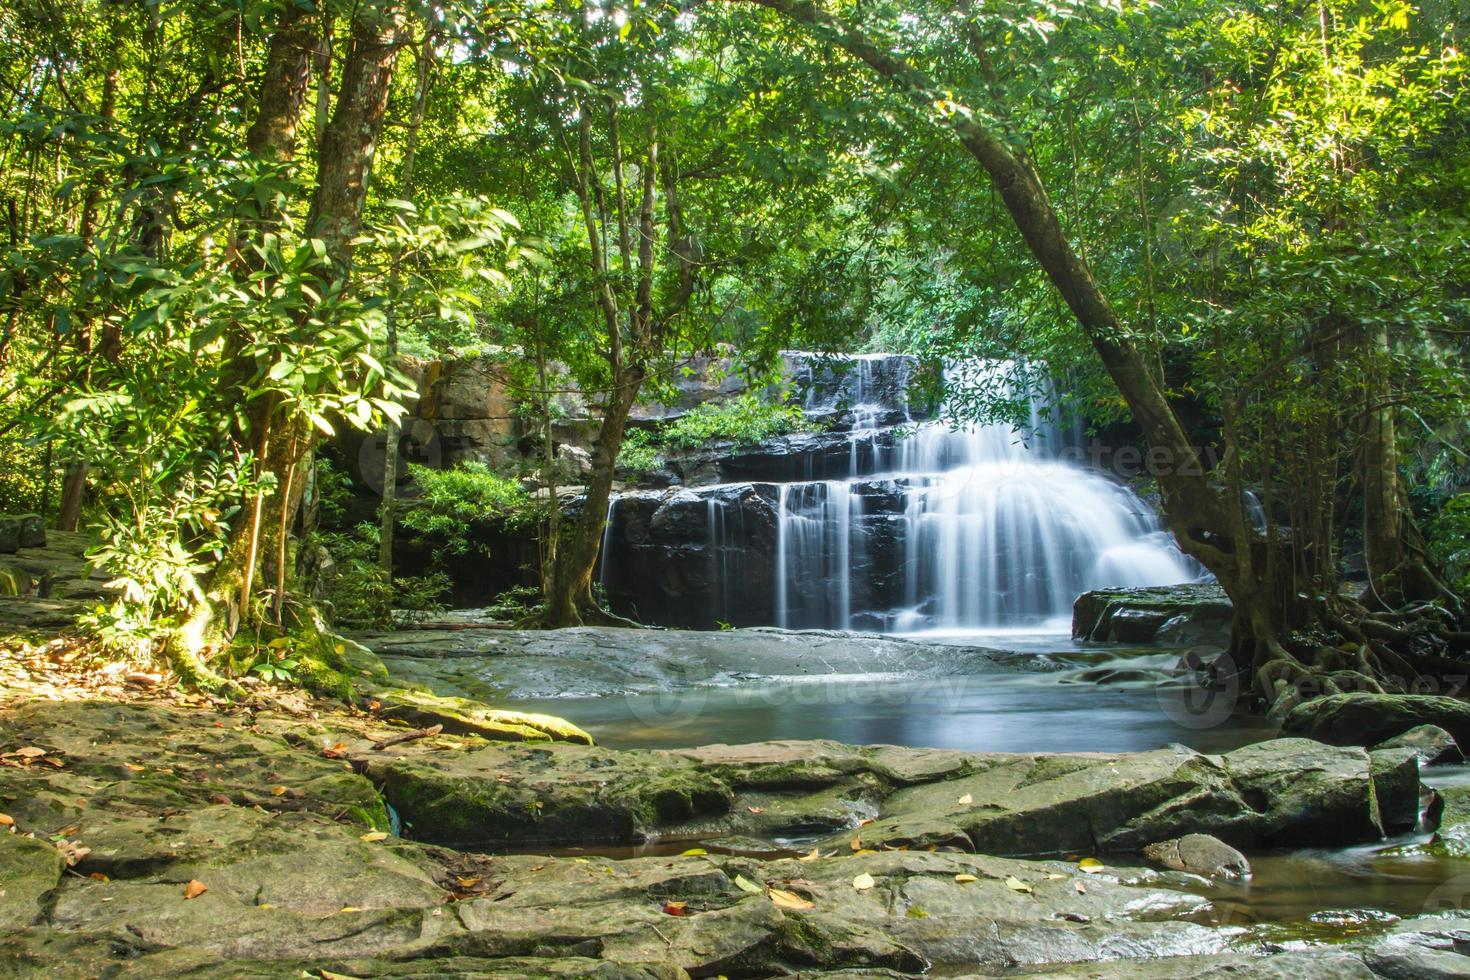 Wasserfall in Thailand (Pang Si Da Wasserfall National Park) foto